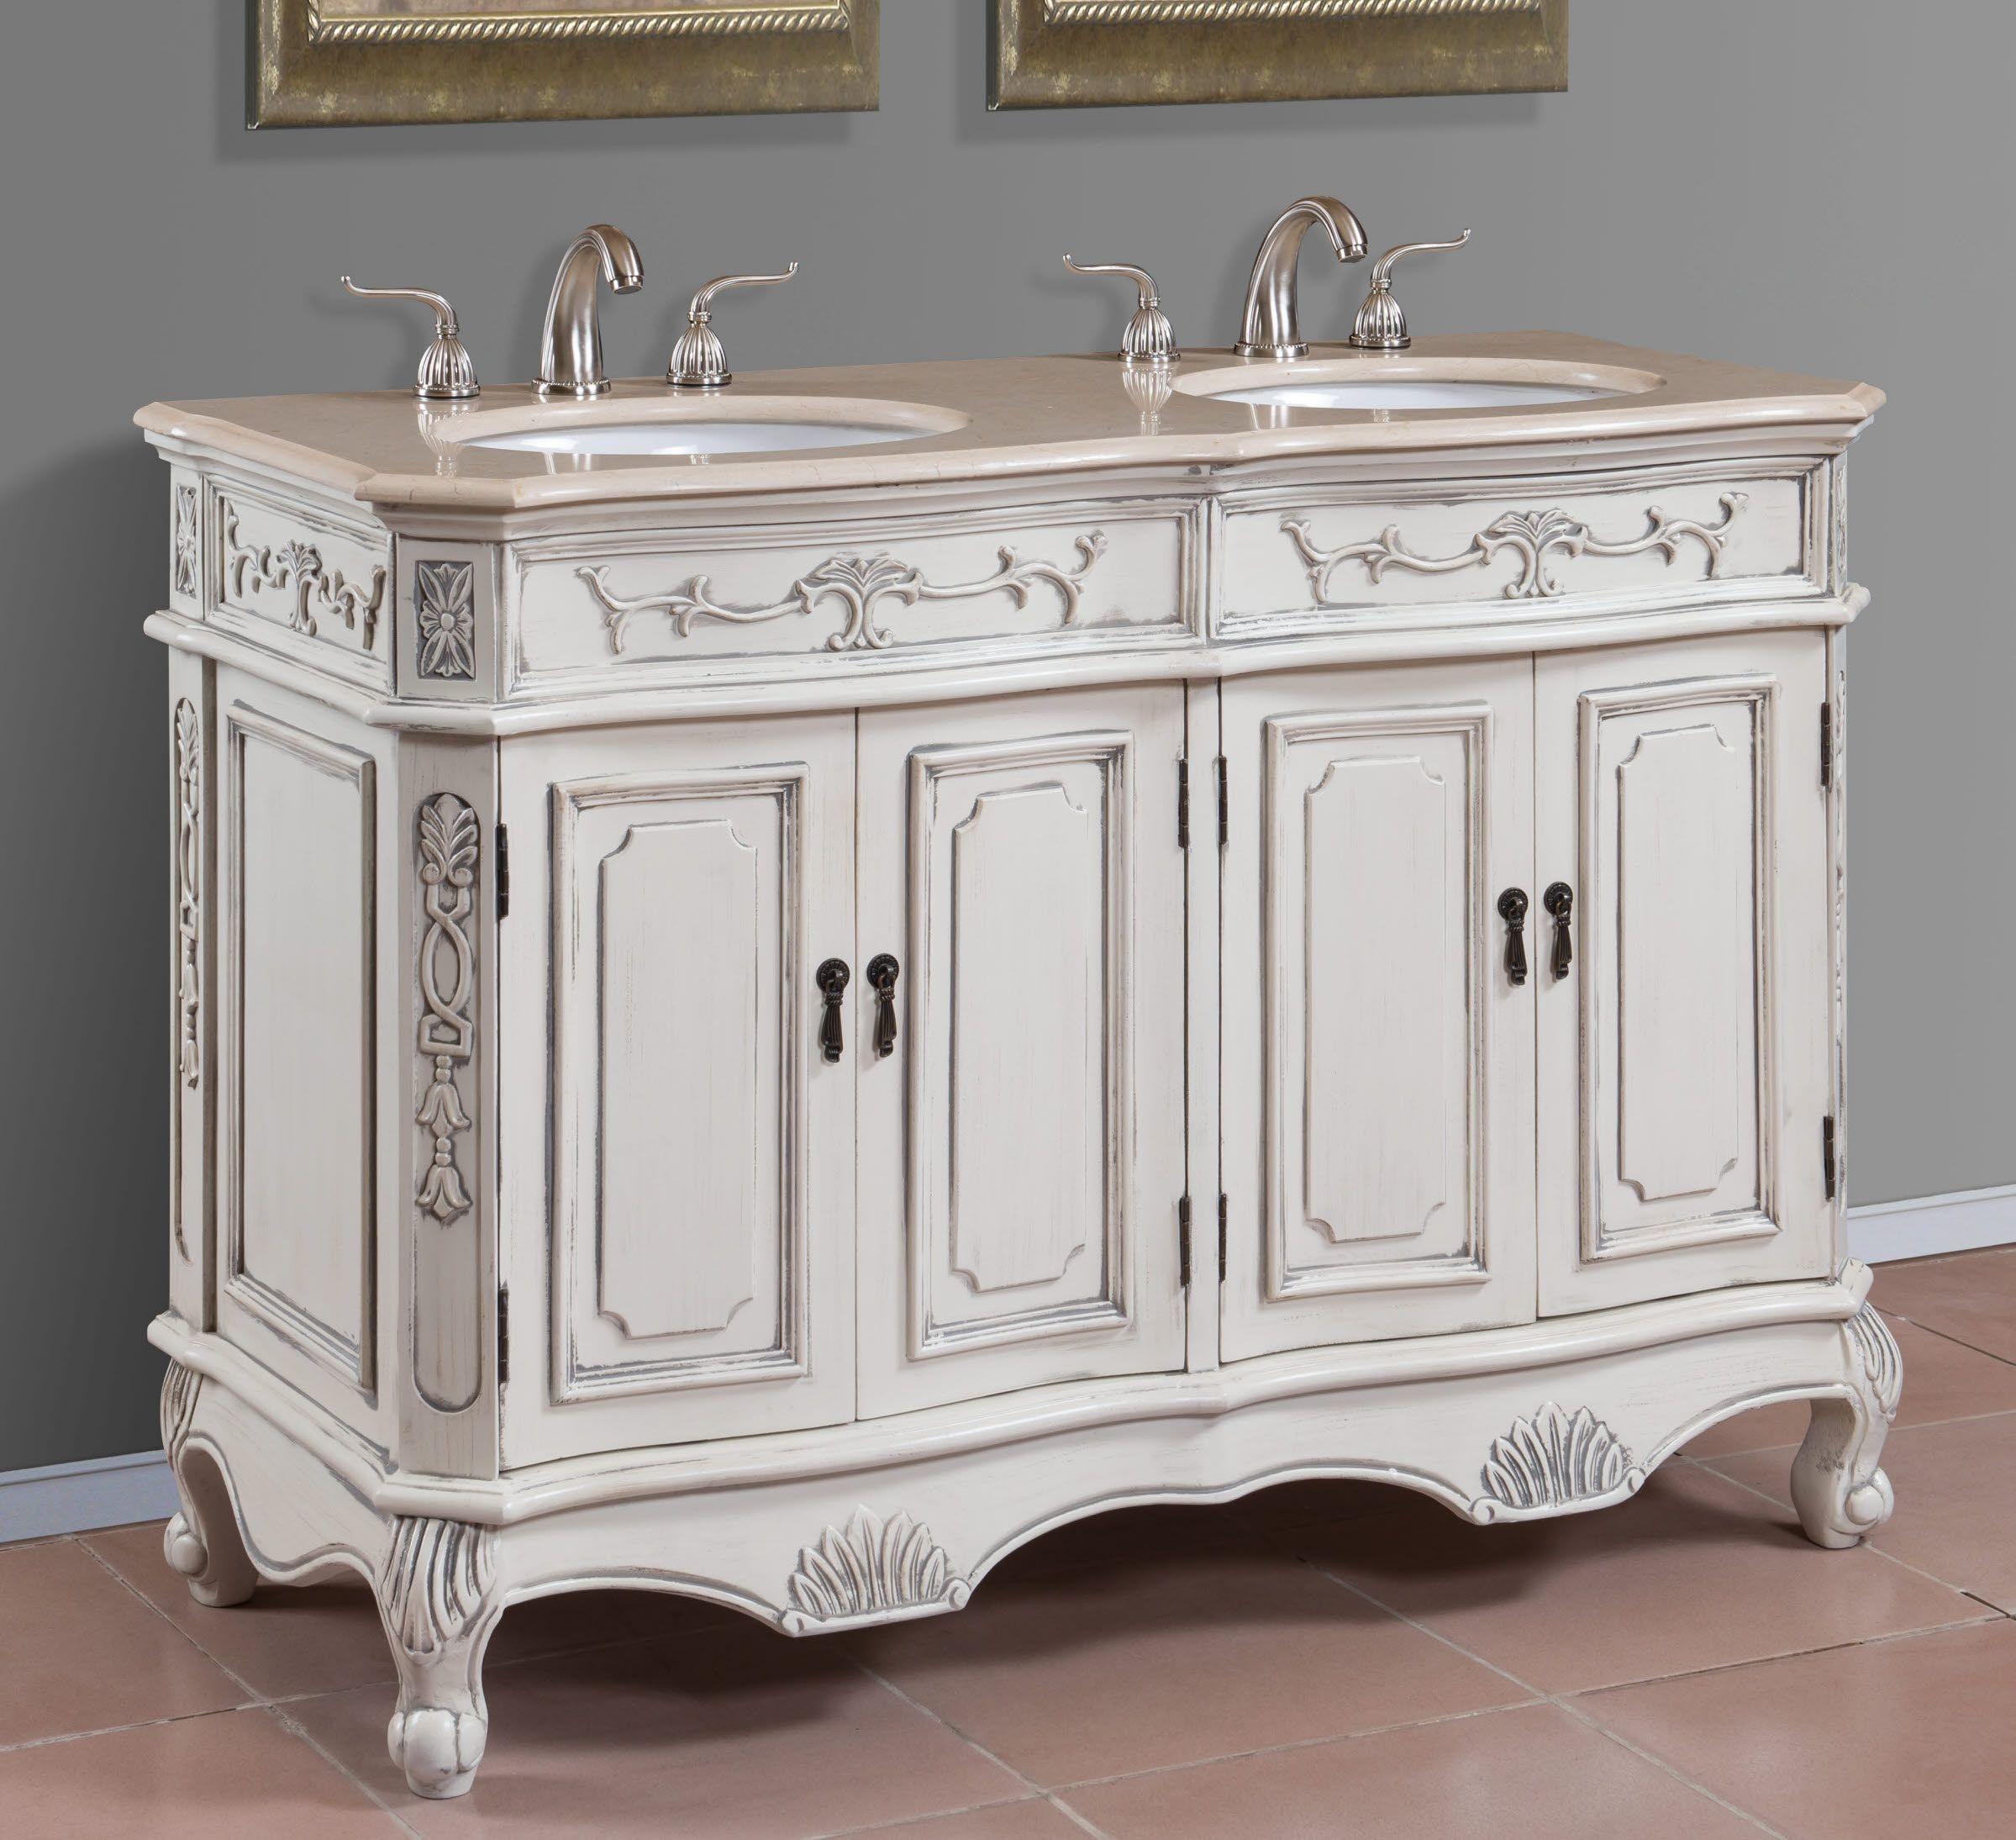 48 Inch Double Sink Vanity You Ll Love, 48 Bathroom Vanity Double Sink